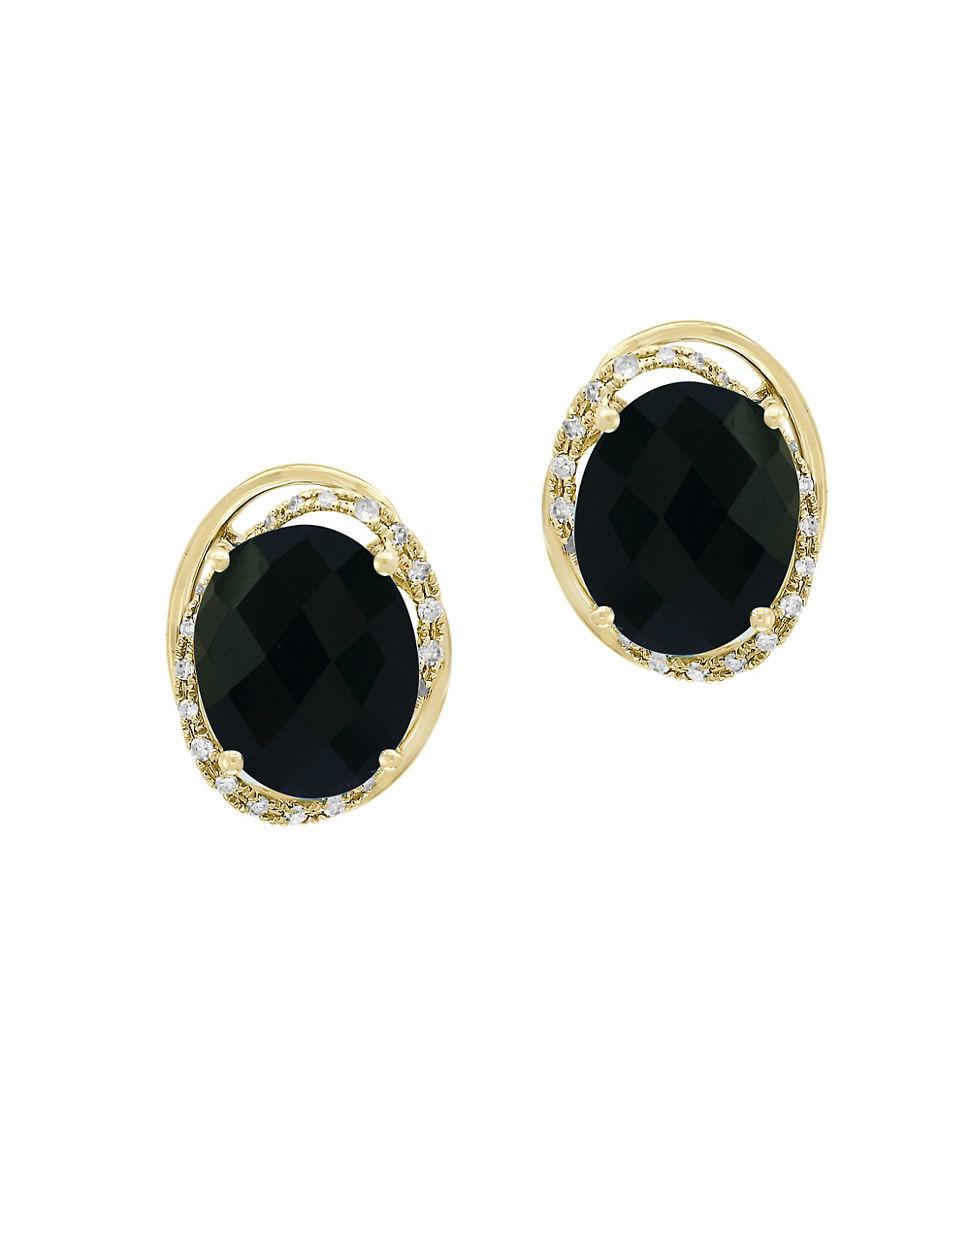 Earrings - Diamond, Pearl, and More | Hudson\'s Bay